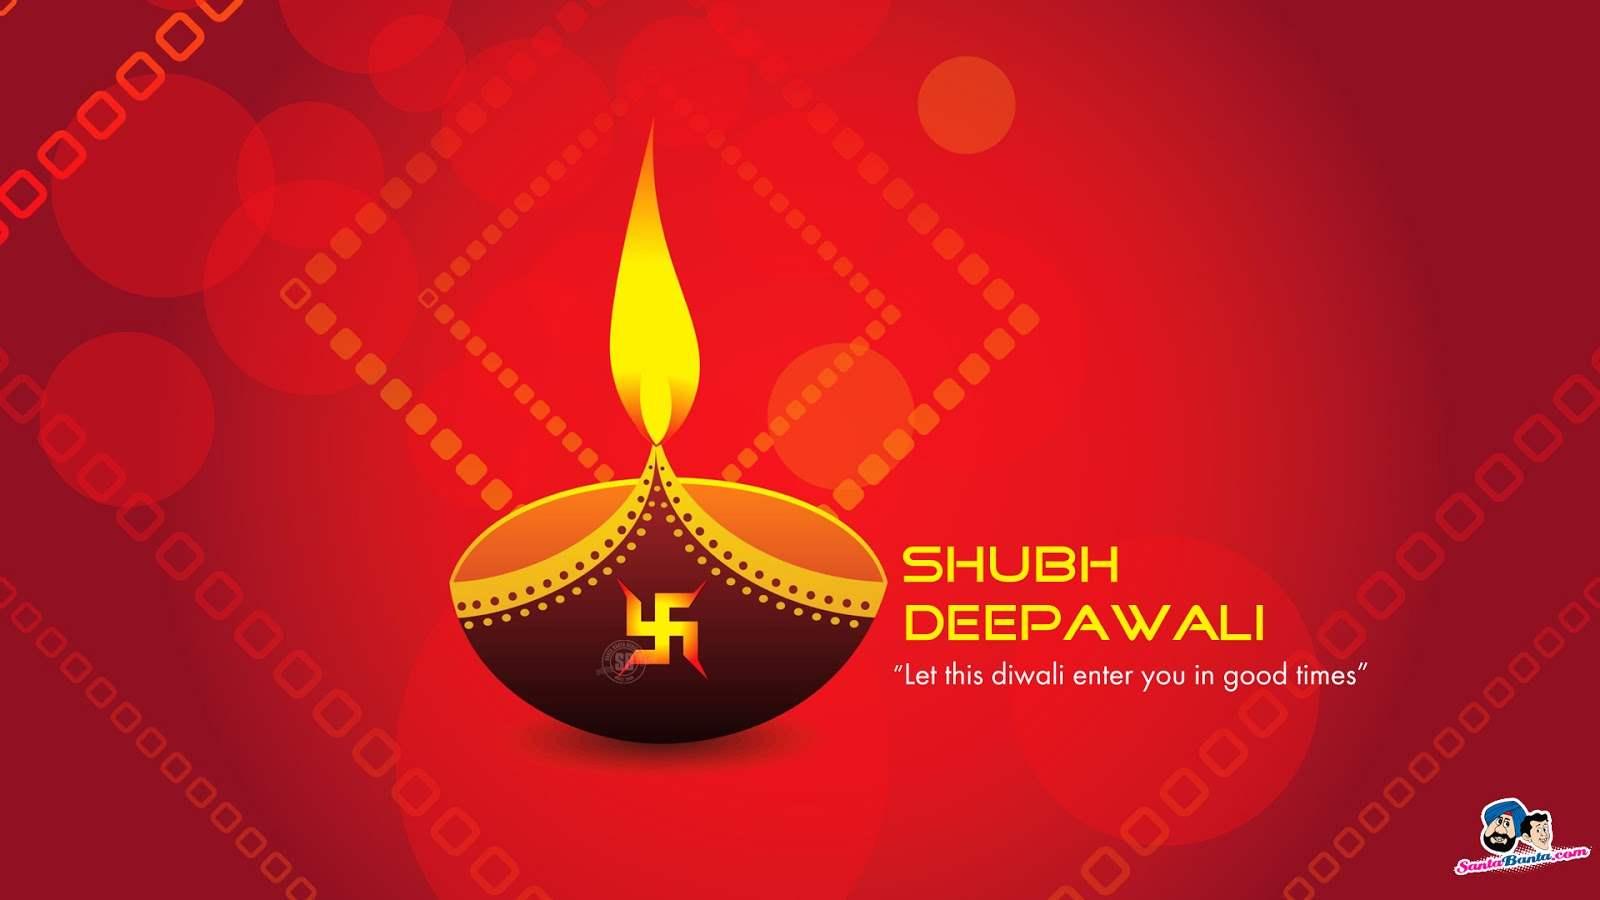 Happy Diwali Wallpapers Images 2015 Designsmag   Happy Diwali 2018 1600x900